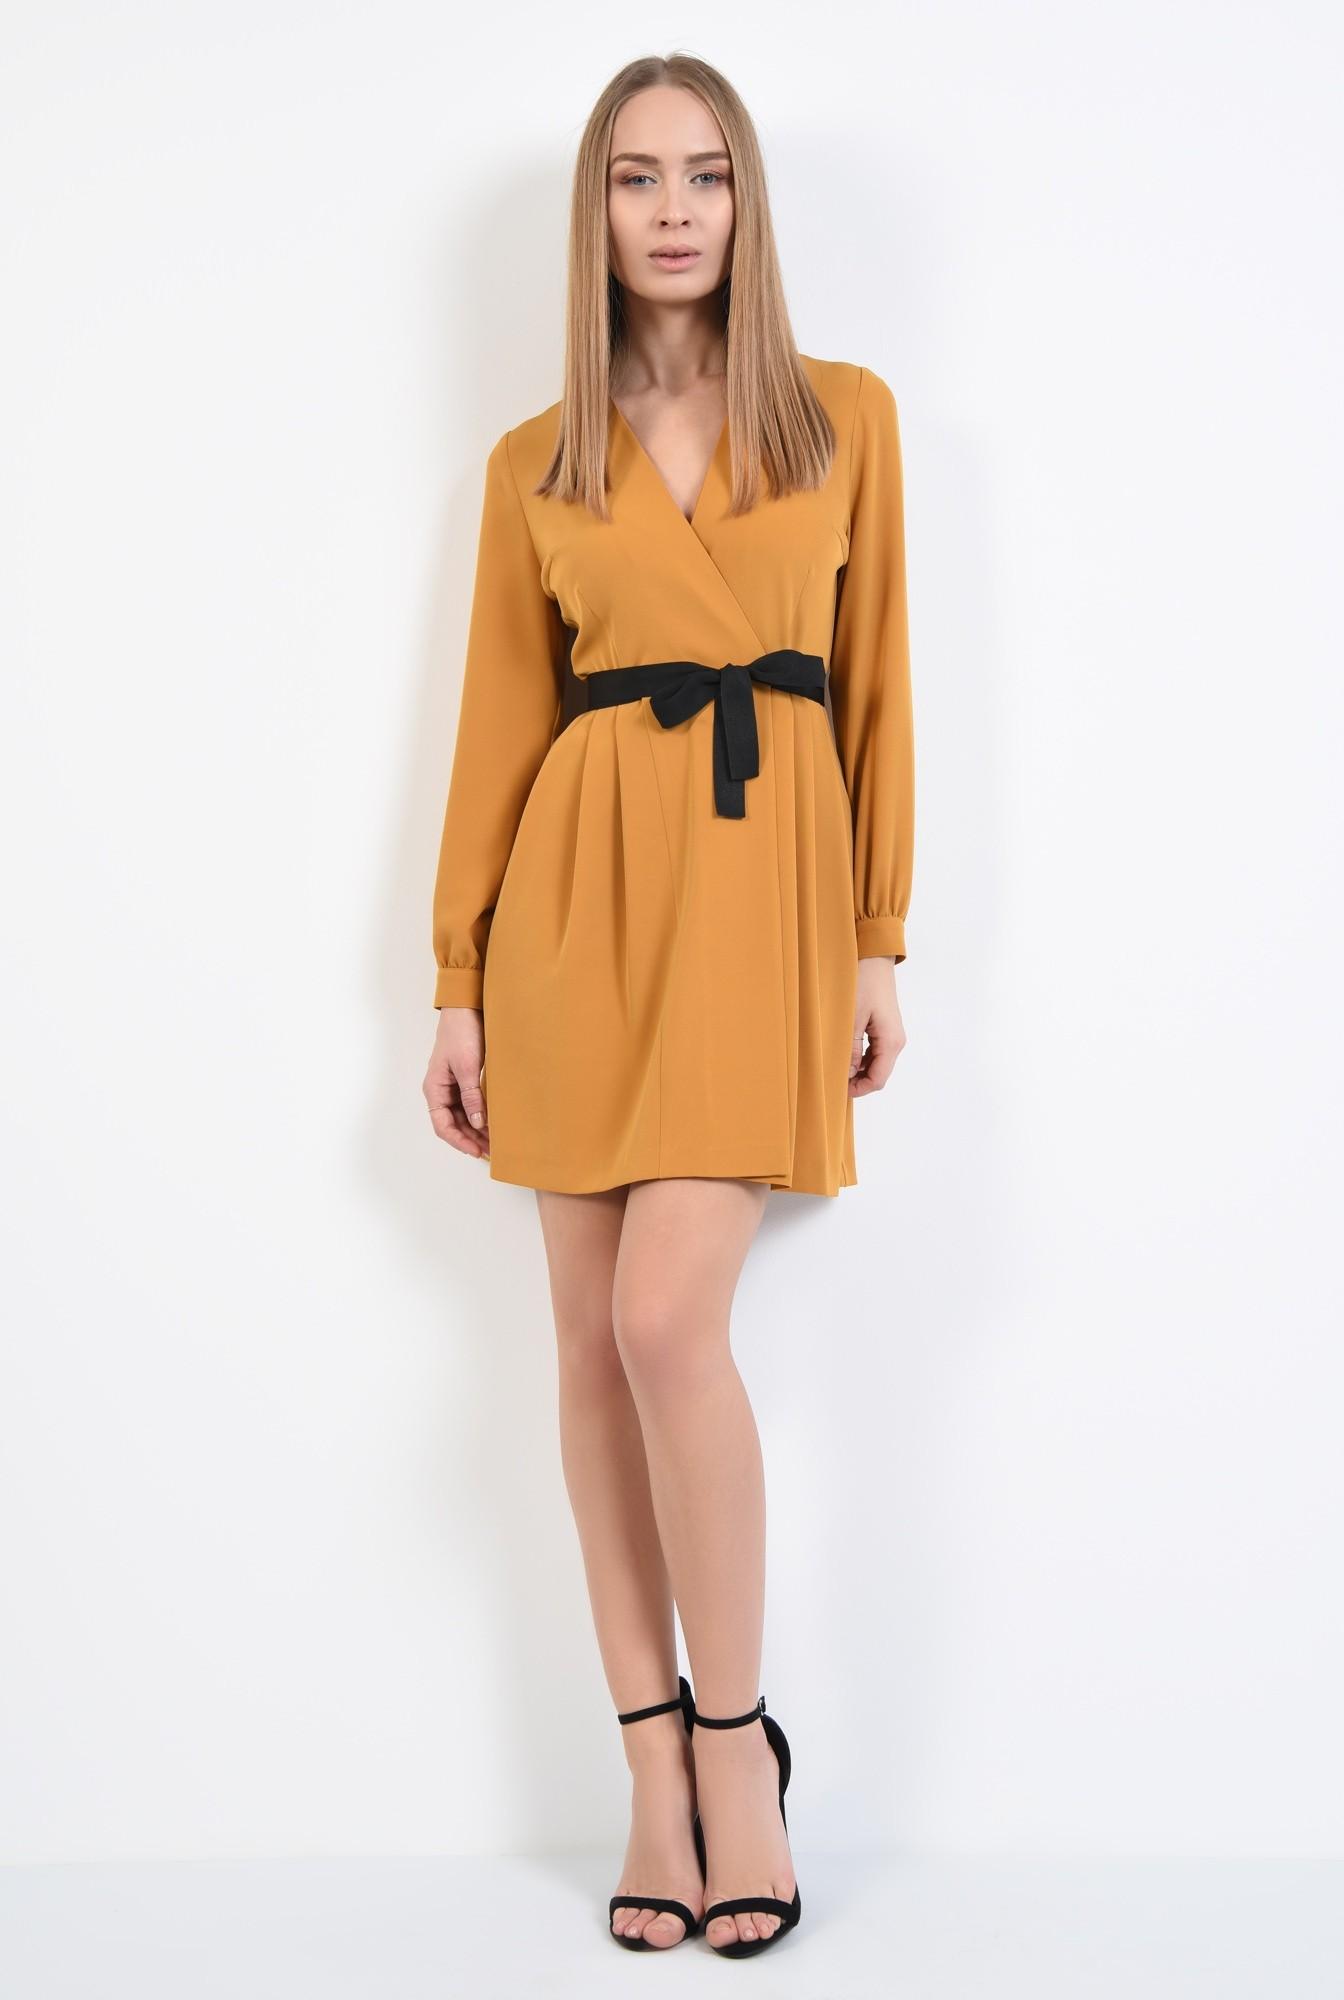 3 - rochie mustar, anchior petrecut, maneci lungi cu manseta, croi parte peste parte